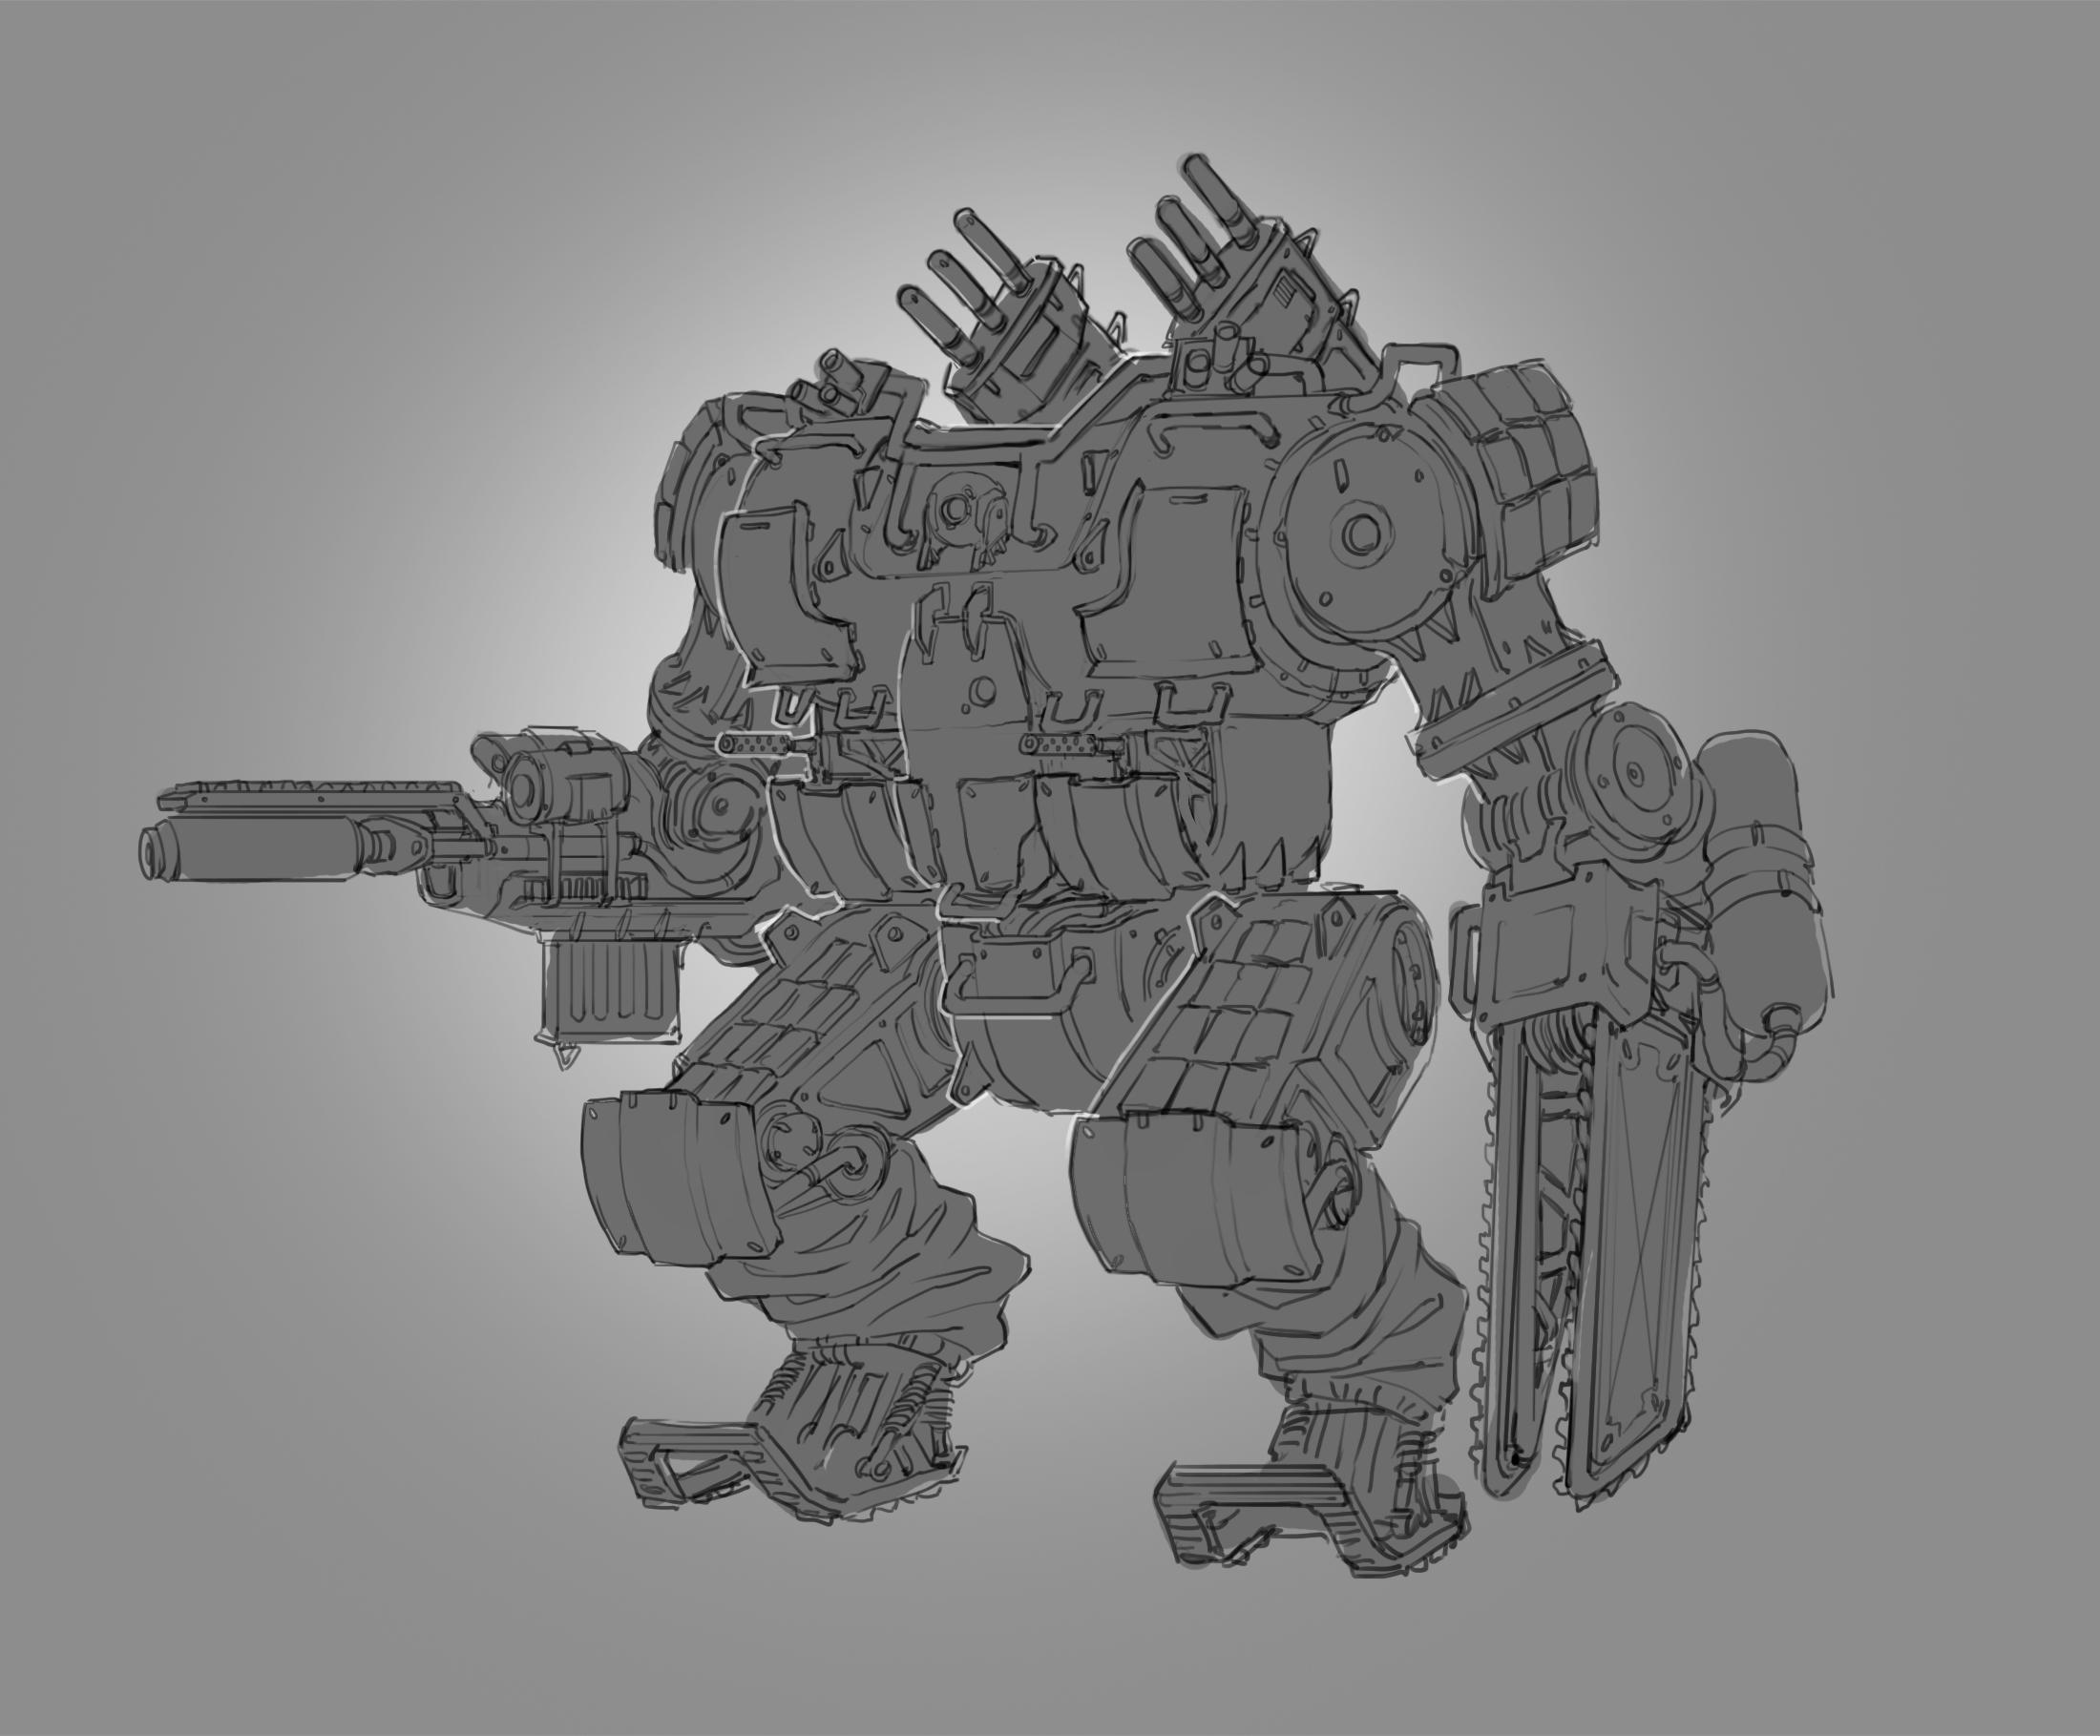 2018.03.23_Rebels Heavy rough sketch_v2.